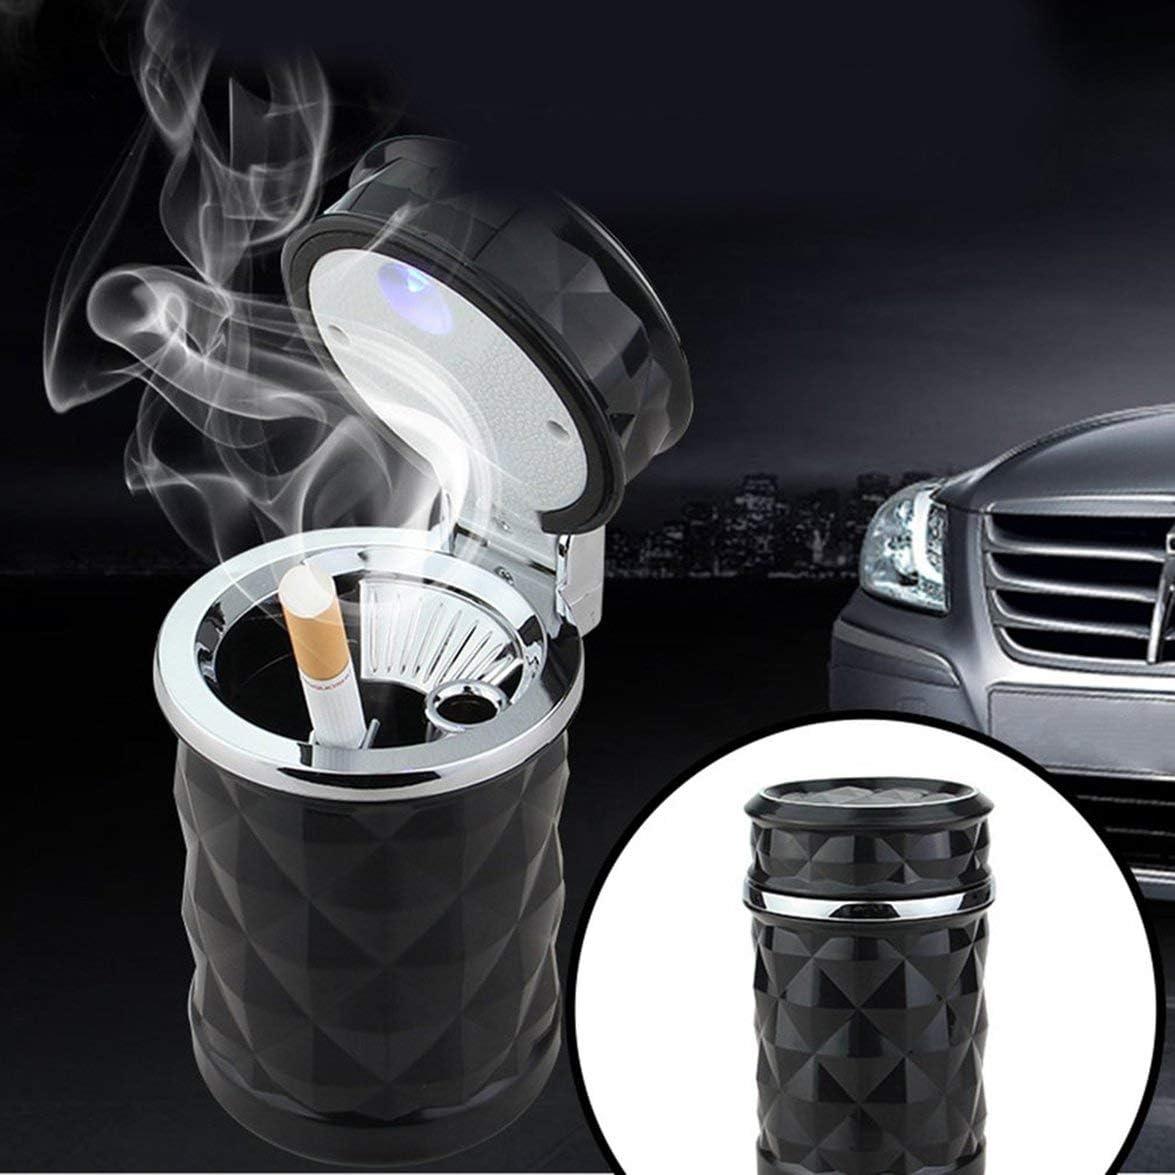 Banbie Auto Aschenbecher sicher flammhemmend Aschenbecher Diamond Cut LED-Leuchtanzeige